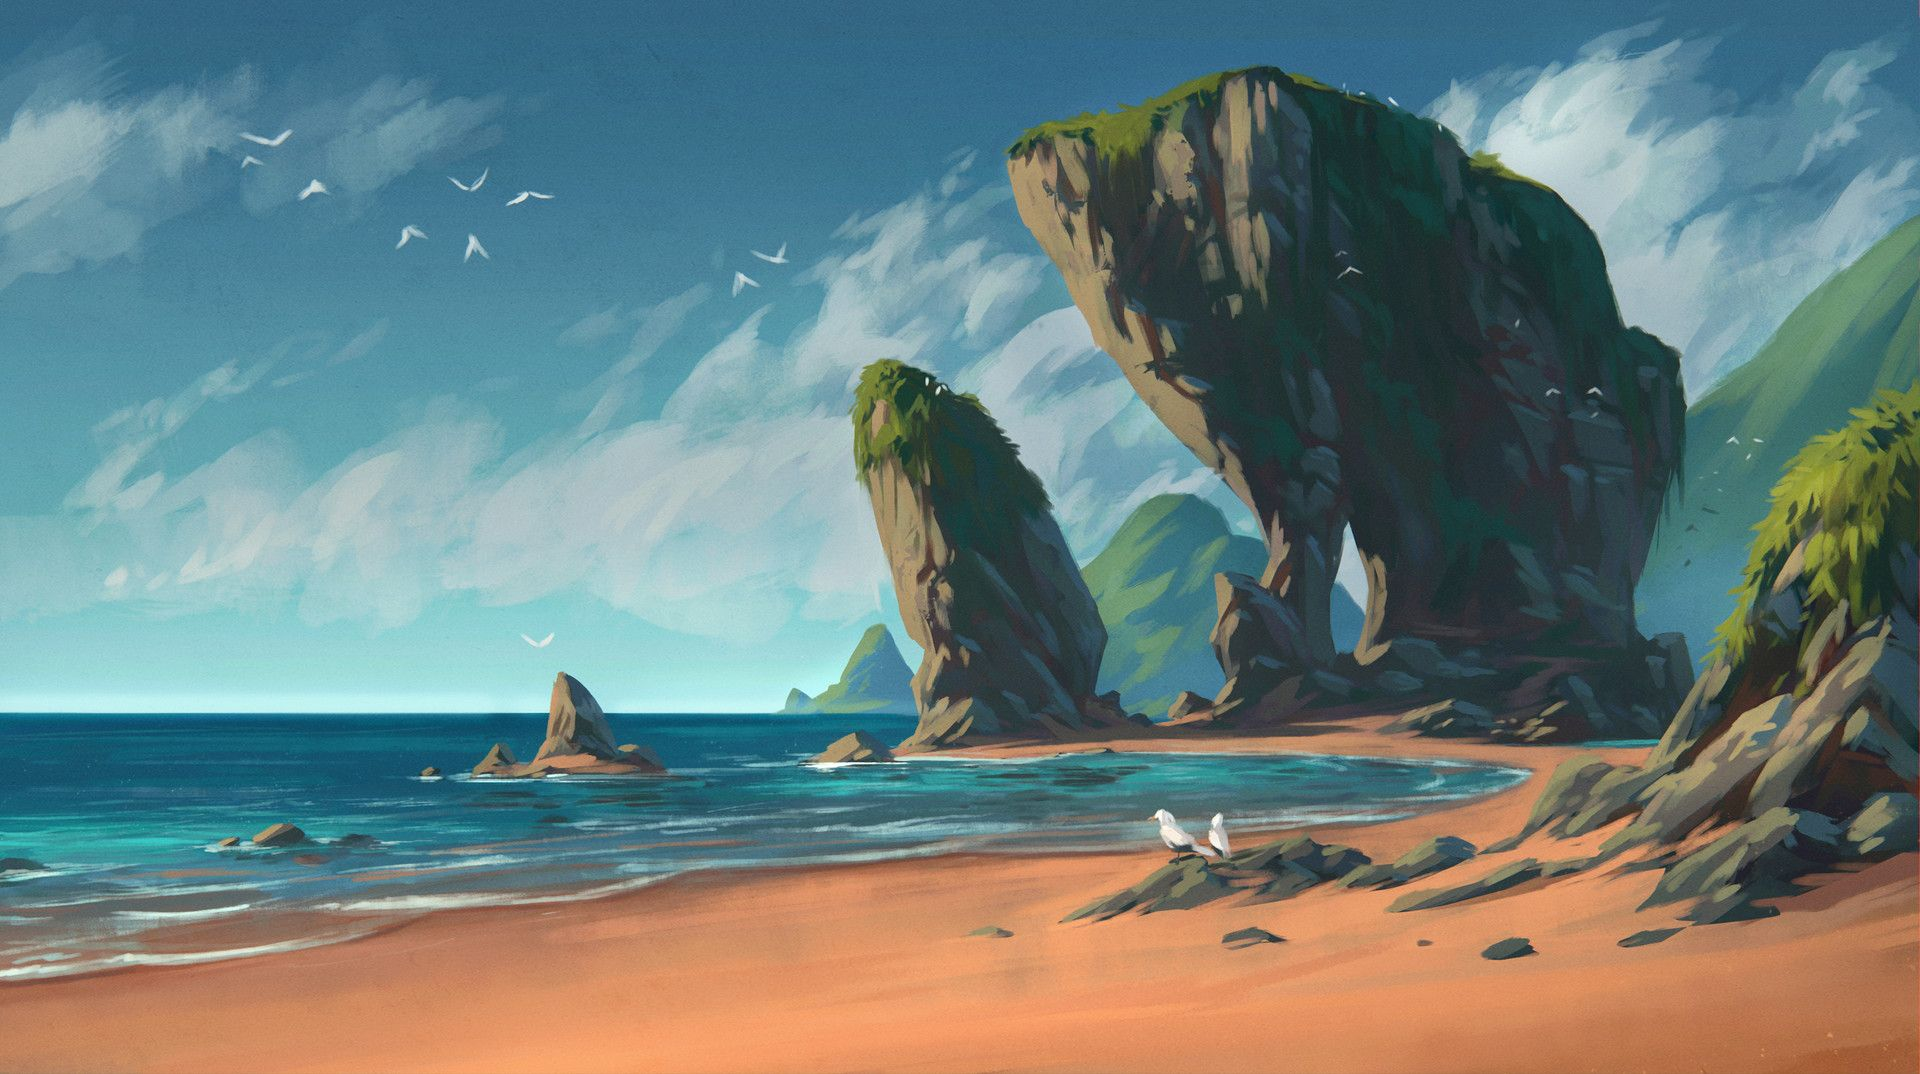 Artstation Tropical Island Beach Todor Hristov Fantasy Landscape Environment Concept Art Beach Landscape